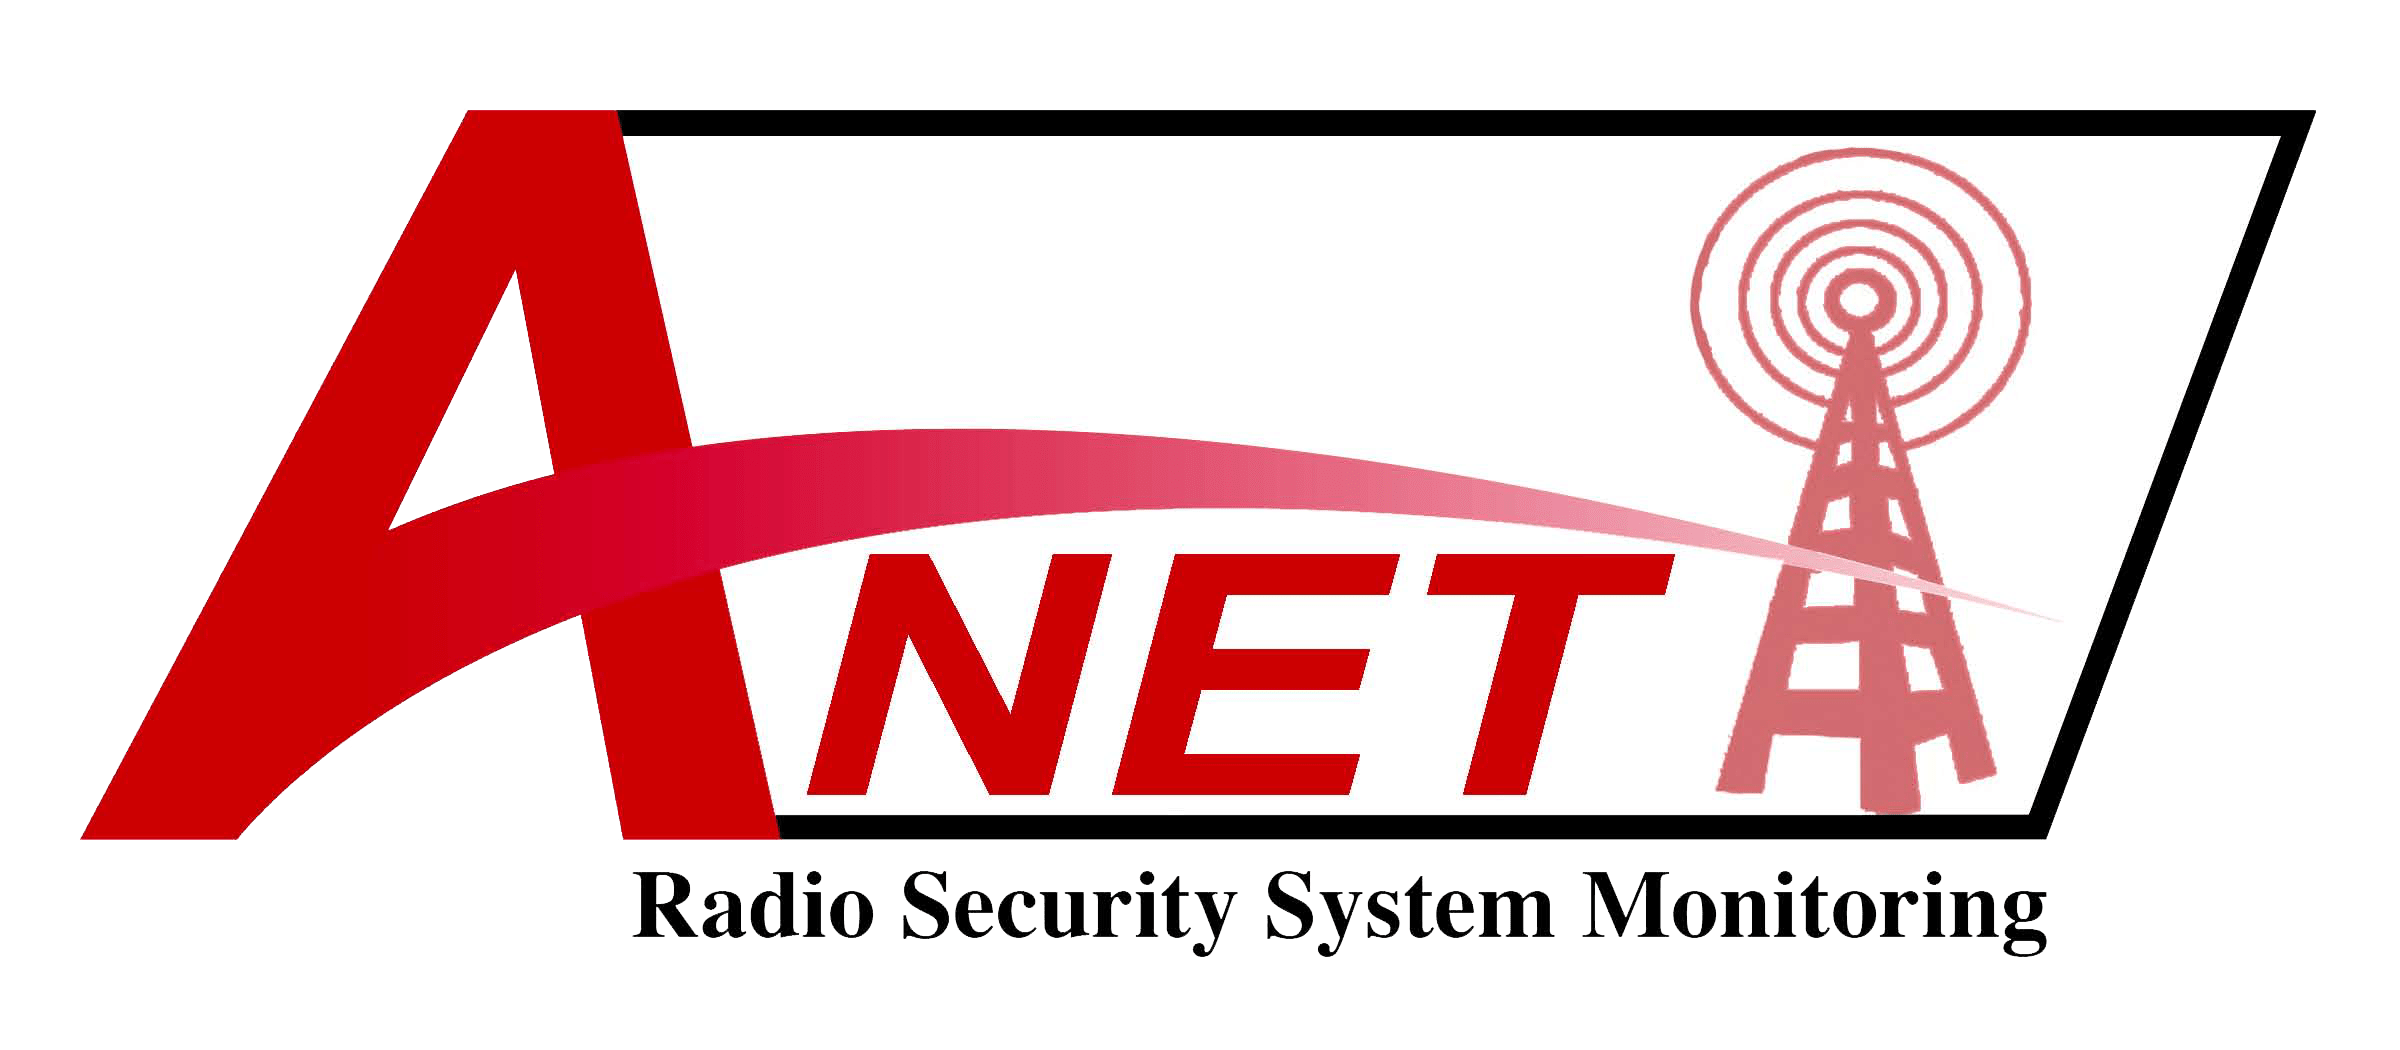 ANET logo radio security system monitoring